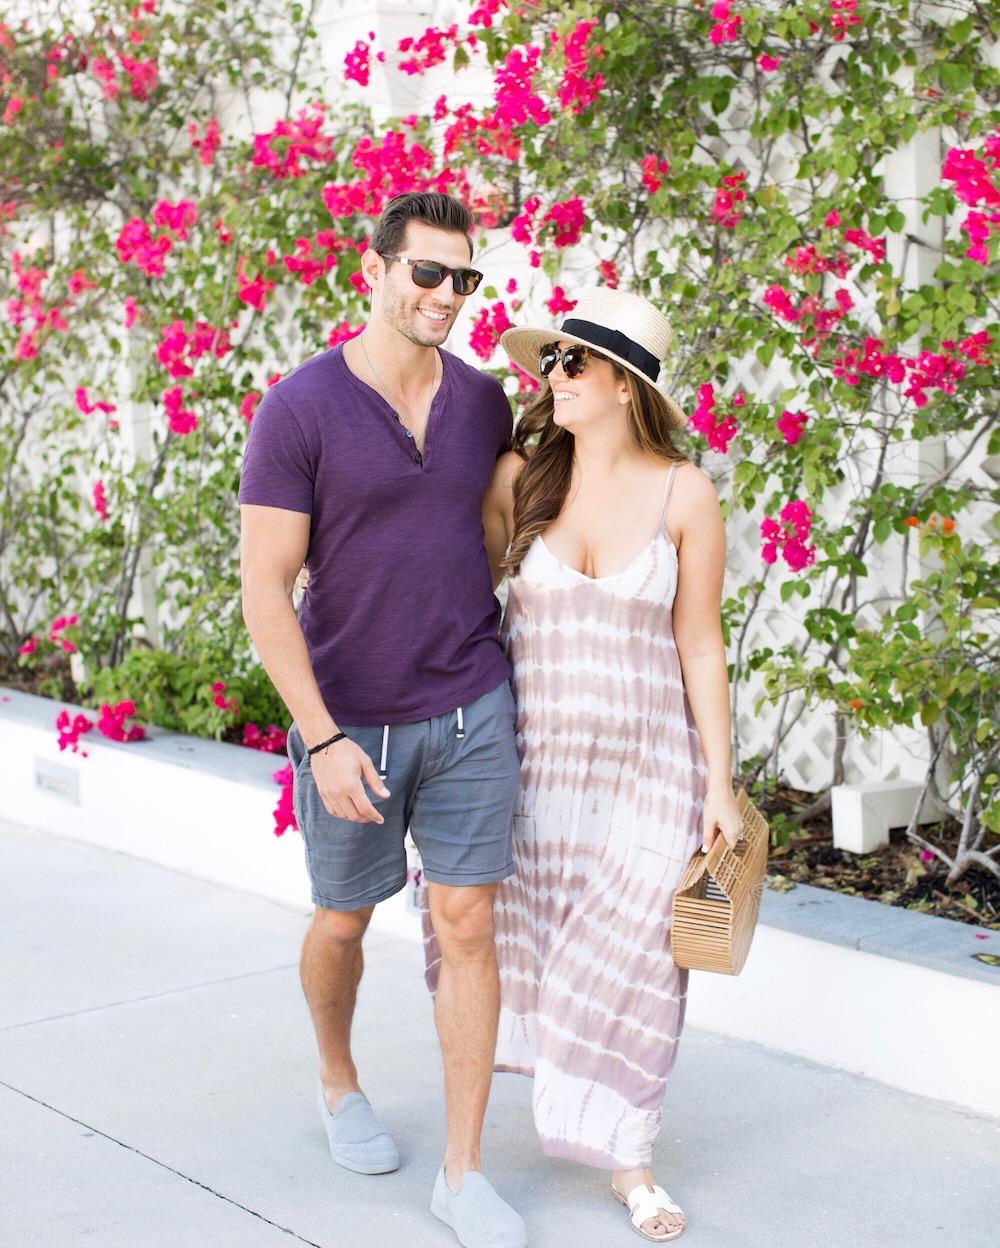 Florida Fashion and Lifestyle Blogger Jaime Cittadino of Sunflowers and Stilettos